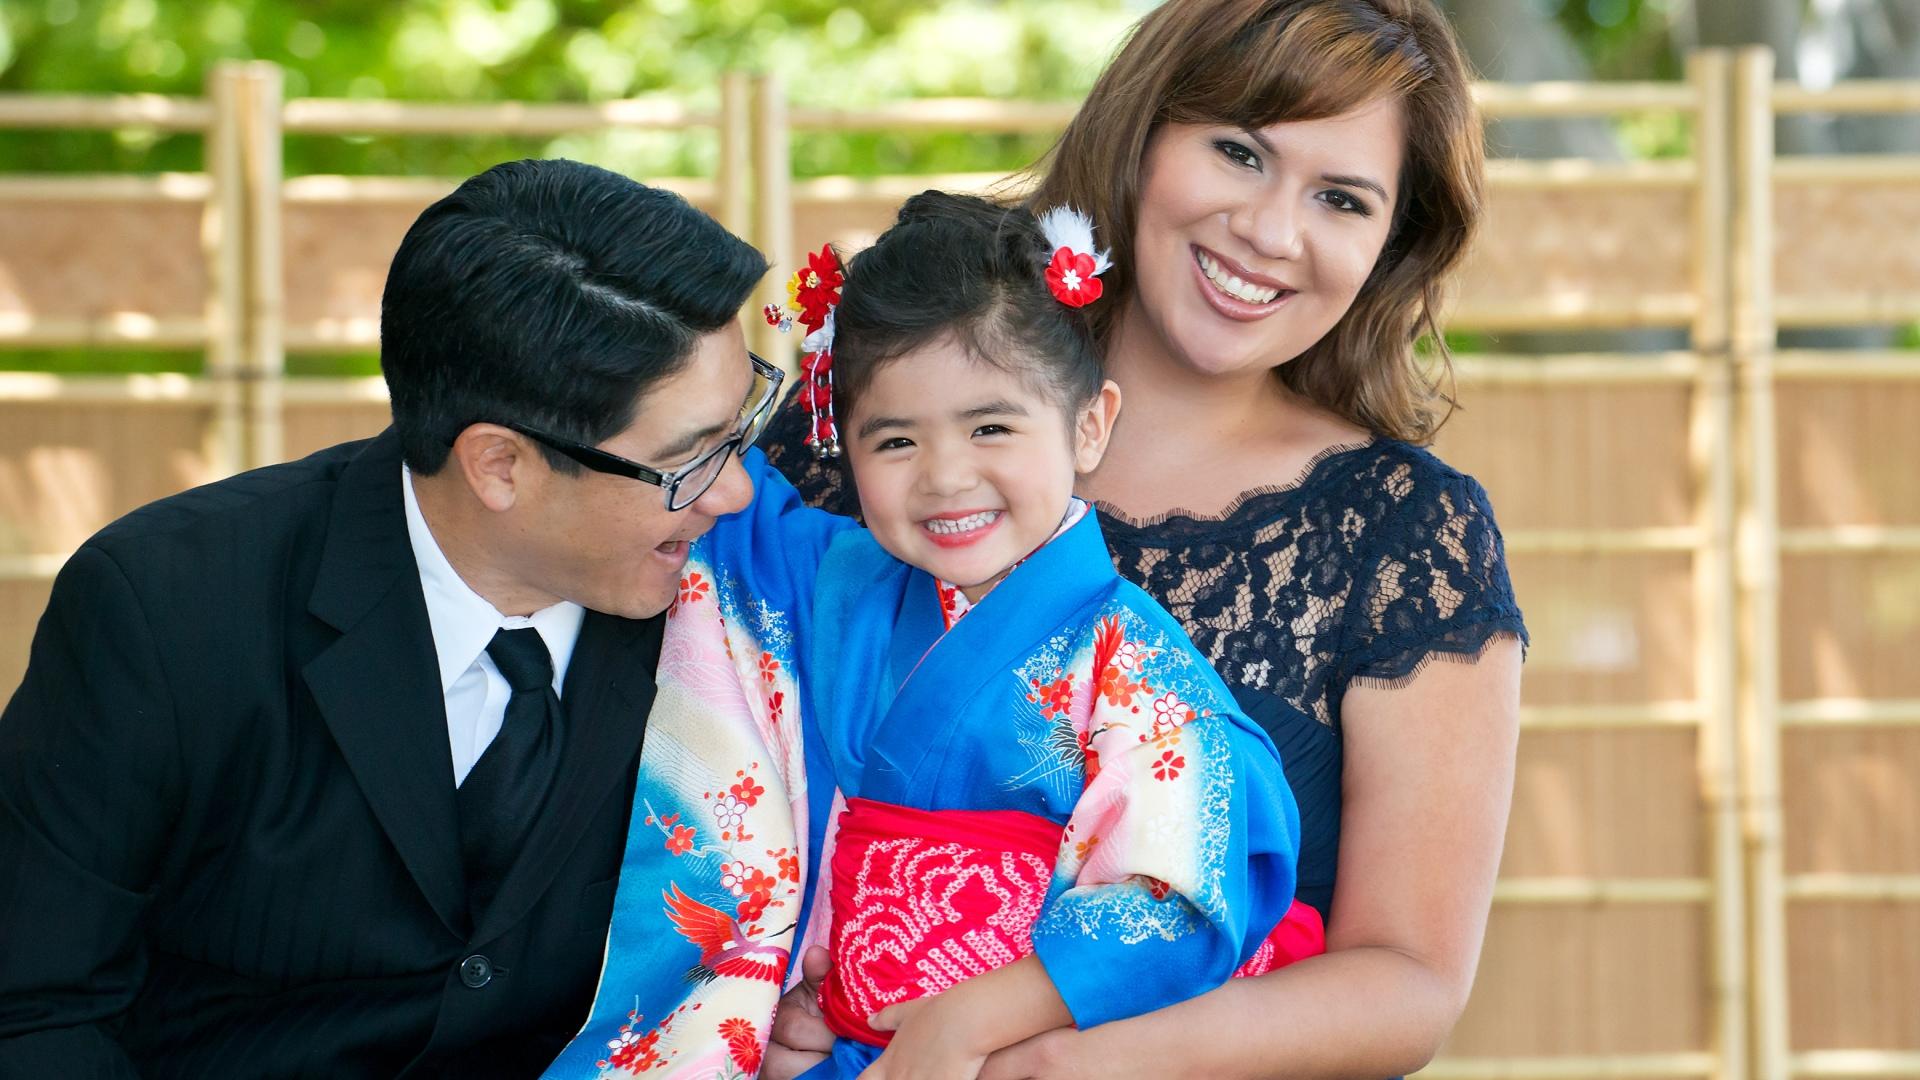 Shichi Go San, girl in blue kimono, family portraits in Los Angeles, Kimono no Kobeya, Asahi Gakuen, Kodomonoie in San Gabriel, Higashi Hongan Ji in Los Angeles, Koyasan in Los Angeles,